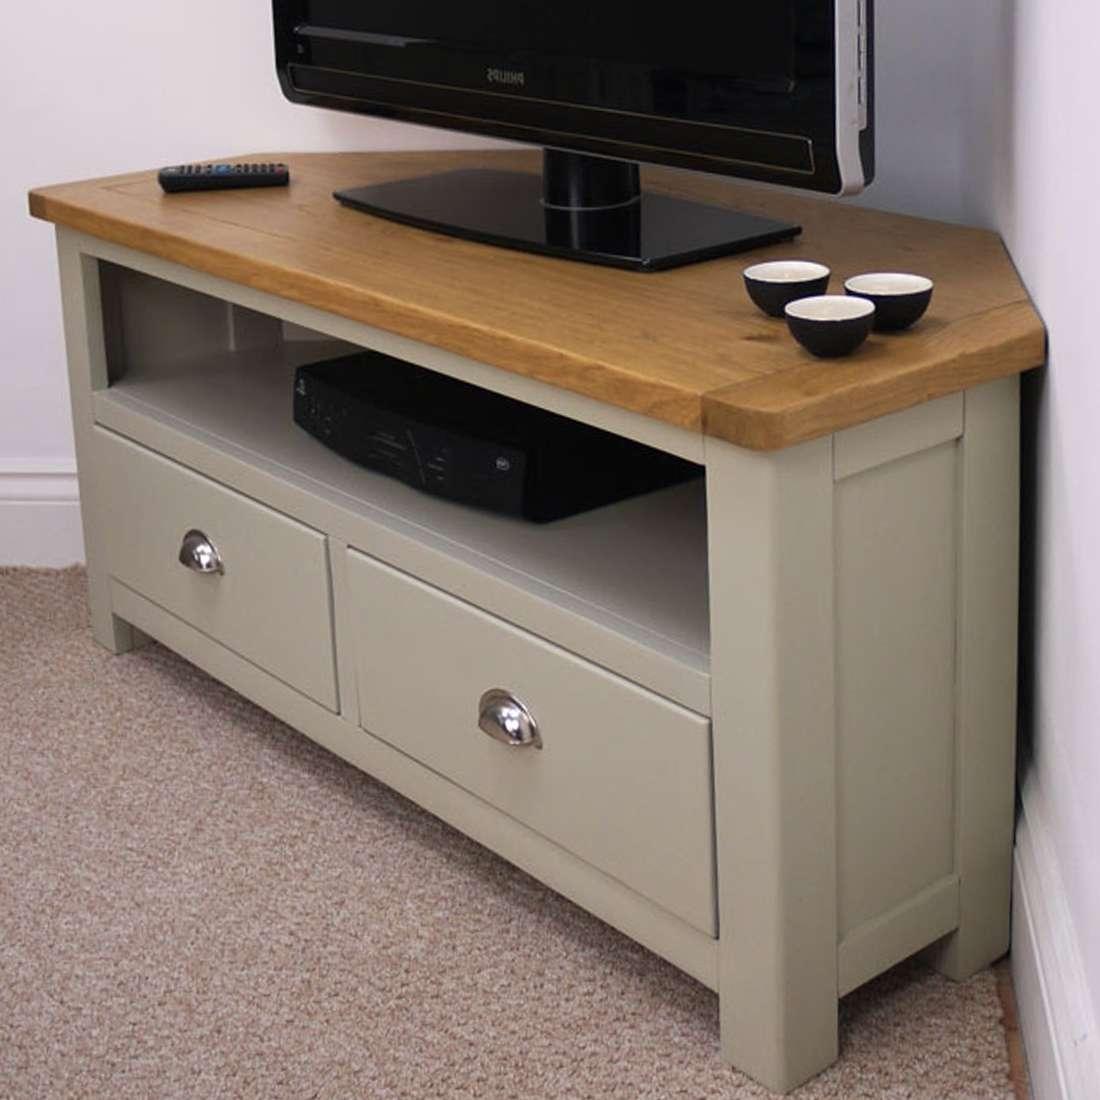 Aspen Oak Corner Tv Unit / Painted Tv Stand / Sage Grey With Oak With Grey Corner Tv Stands (View 2 of 15)